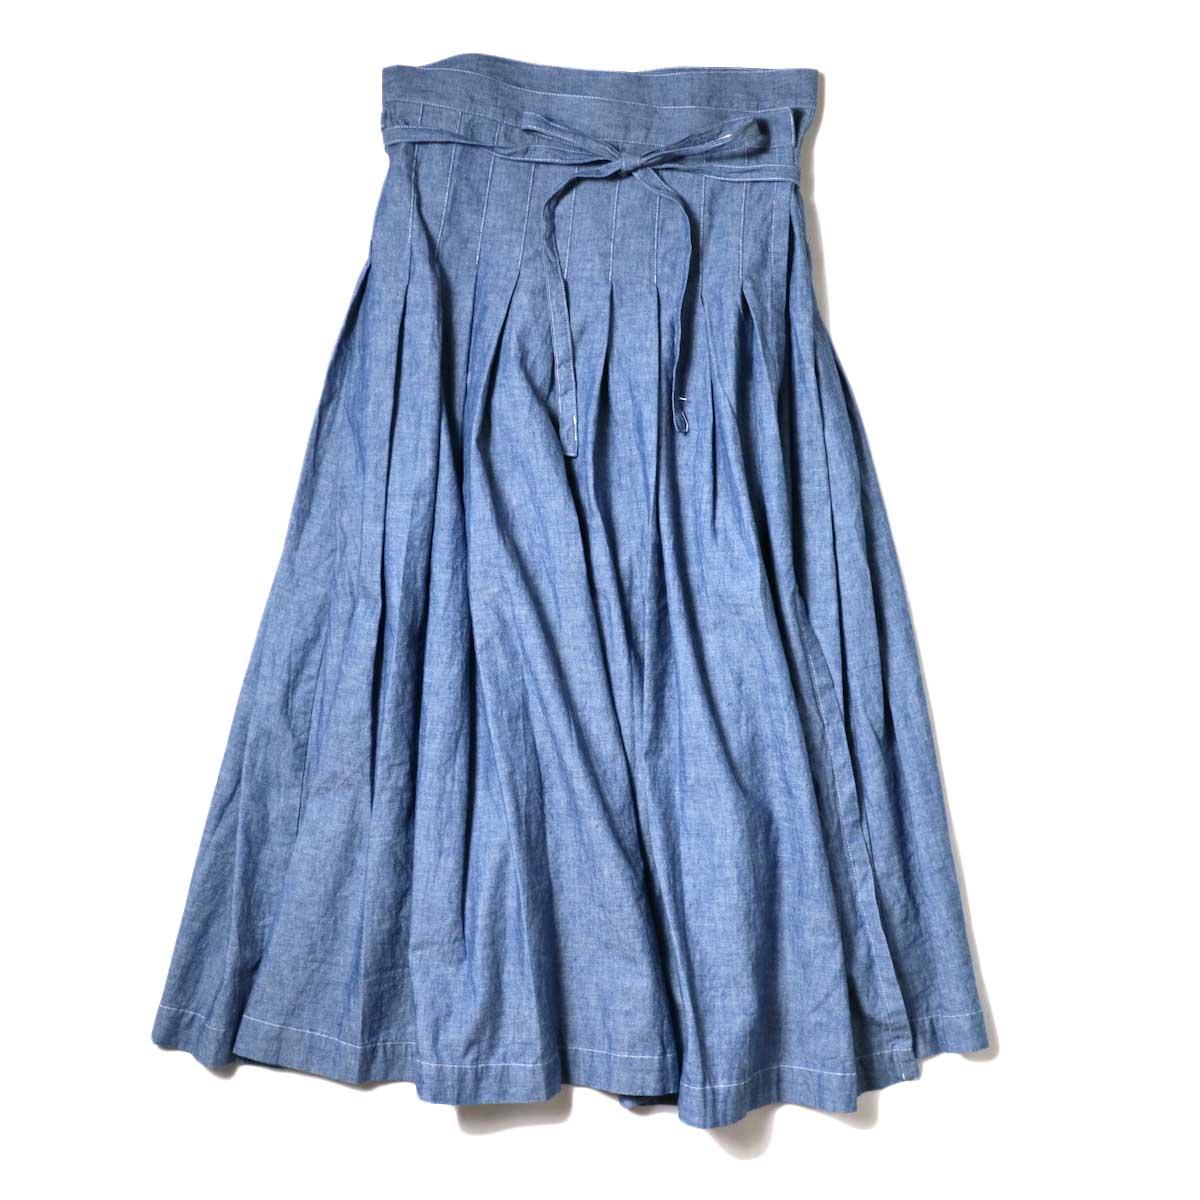 ARMEN / Pleated Wrap Skirt (Blue Chambray)